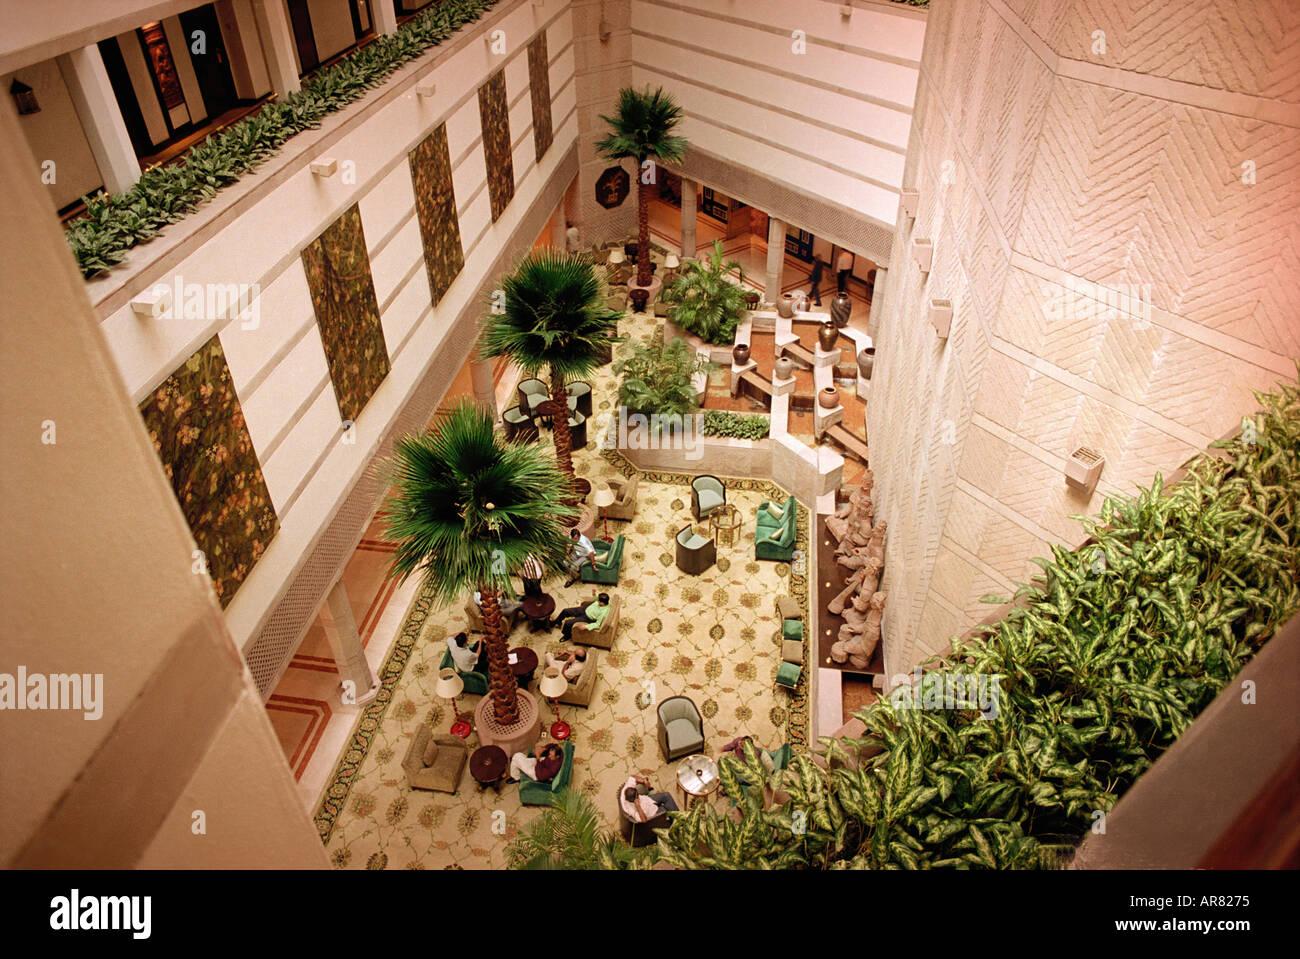 ITC Sonar Bangla hotel Calcutta now Kolkata West Bengal India - Stock Image